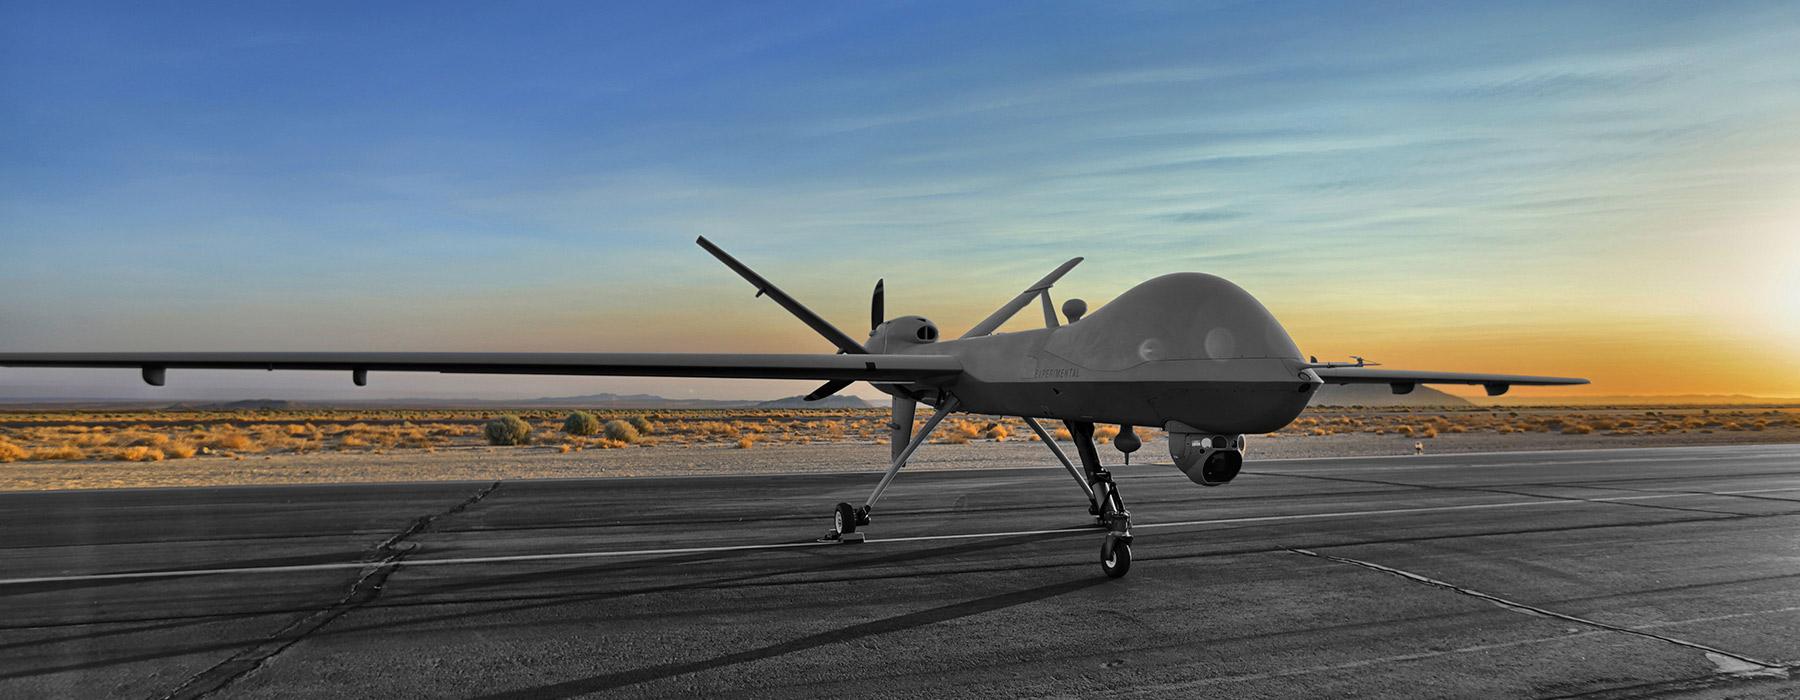 Intelligence, Surveillance, Reconnaissance (ISR) Operations (Manned & Un-Manned)